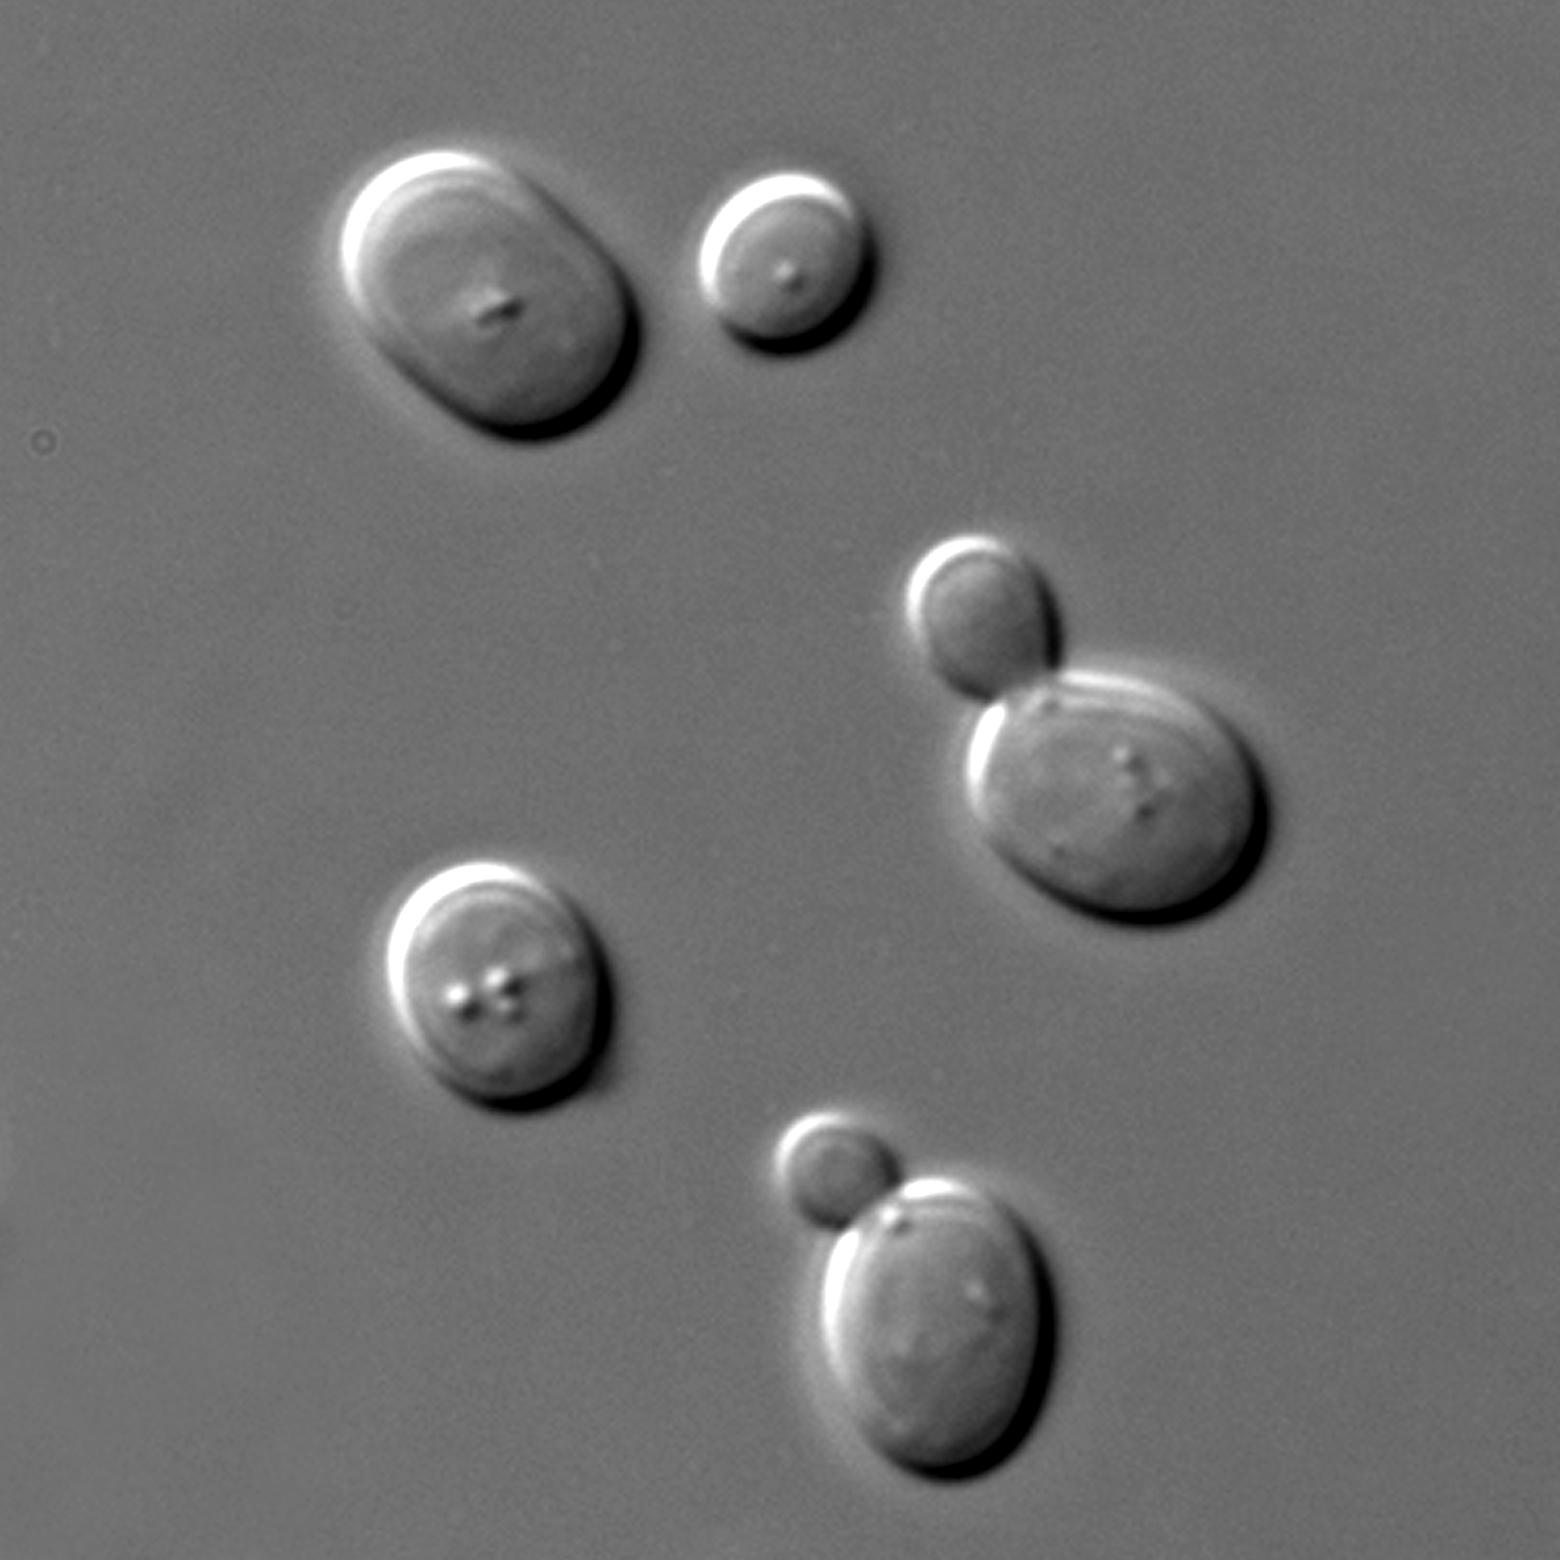 MicroBrasserie et Cie Belfort - Image d'illustration Wikipedia levures au microscope - brassage de bière